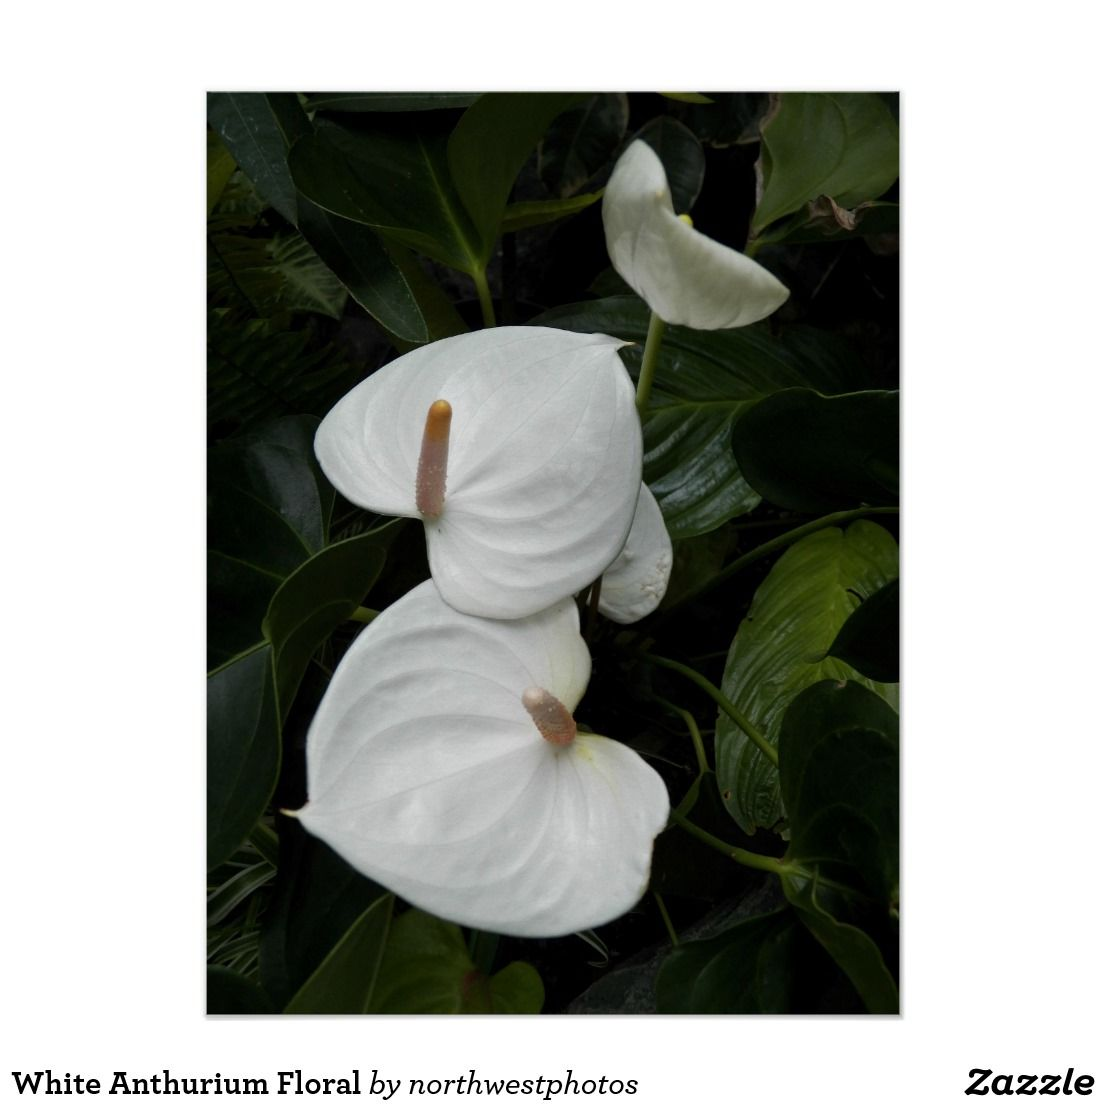 White Anthurium Floral Poster Floral Poster Anthurium Flower Poster Prints